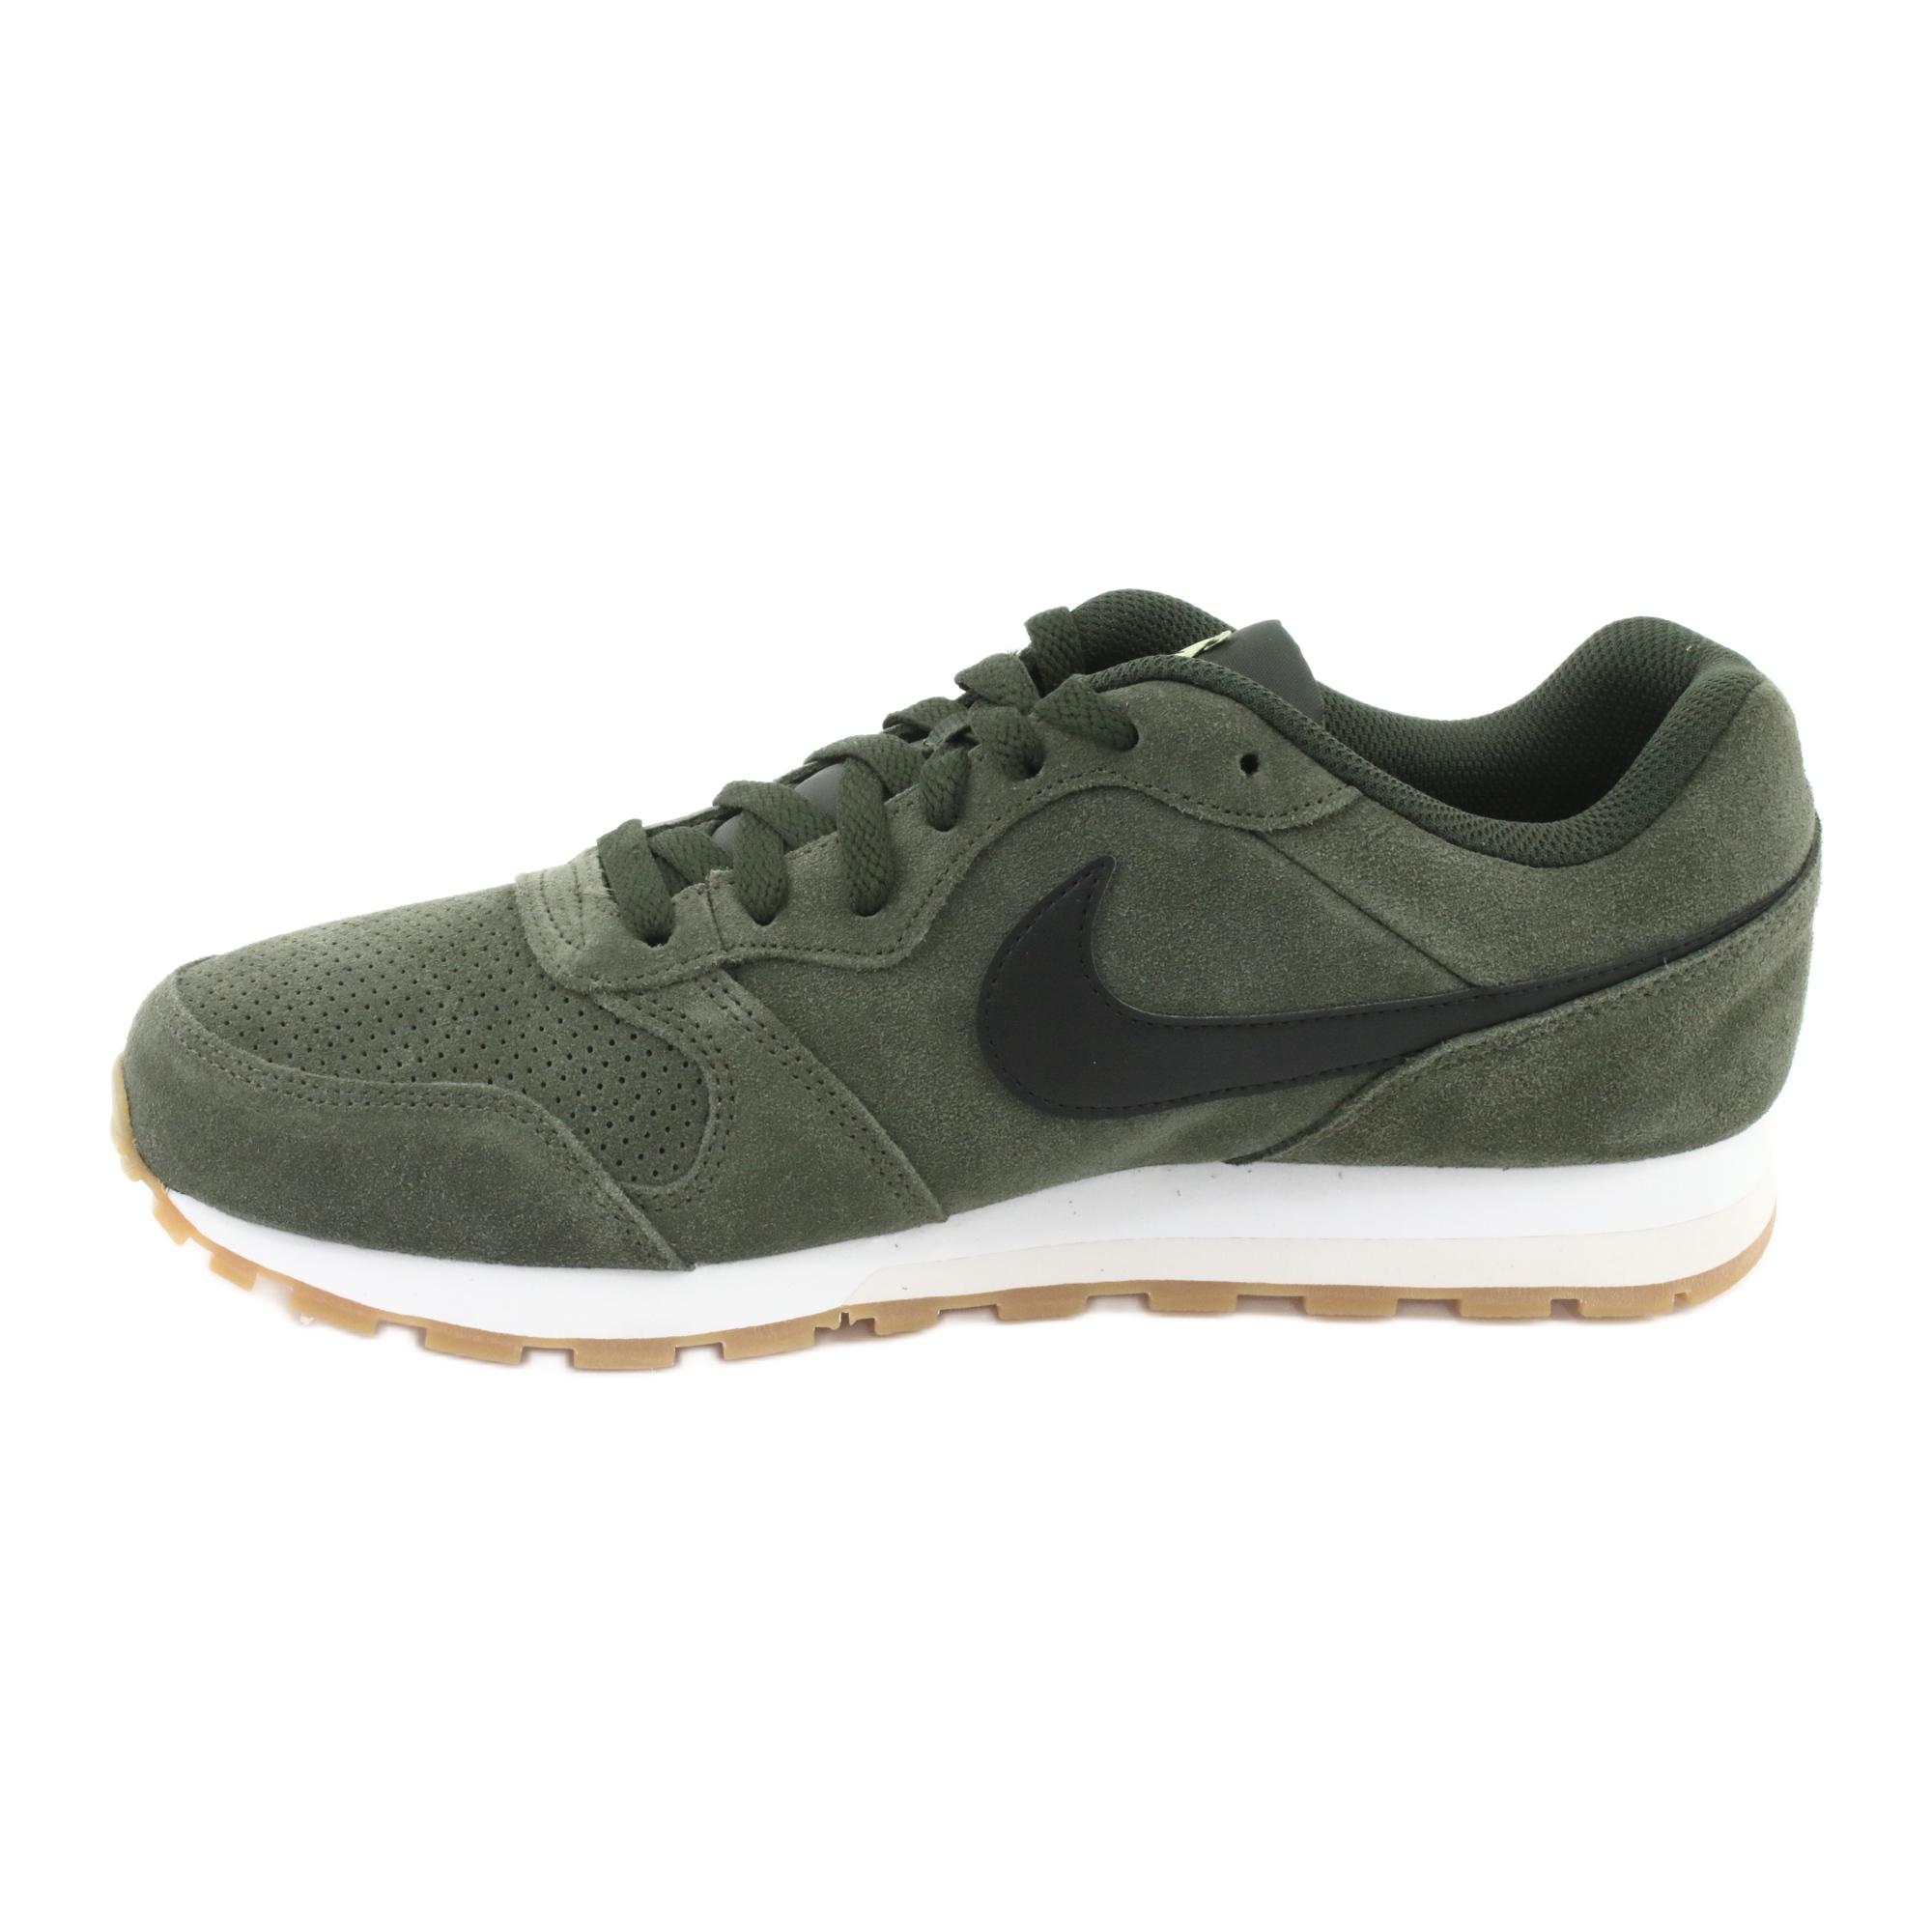 Pronombre captura Fraude  Pantofi Nike Md Runner 2 Suede M AQ9211-300 kaki - ButyModne.pl